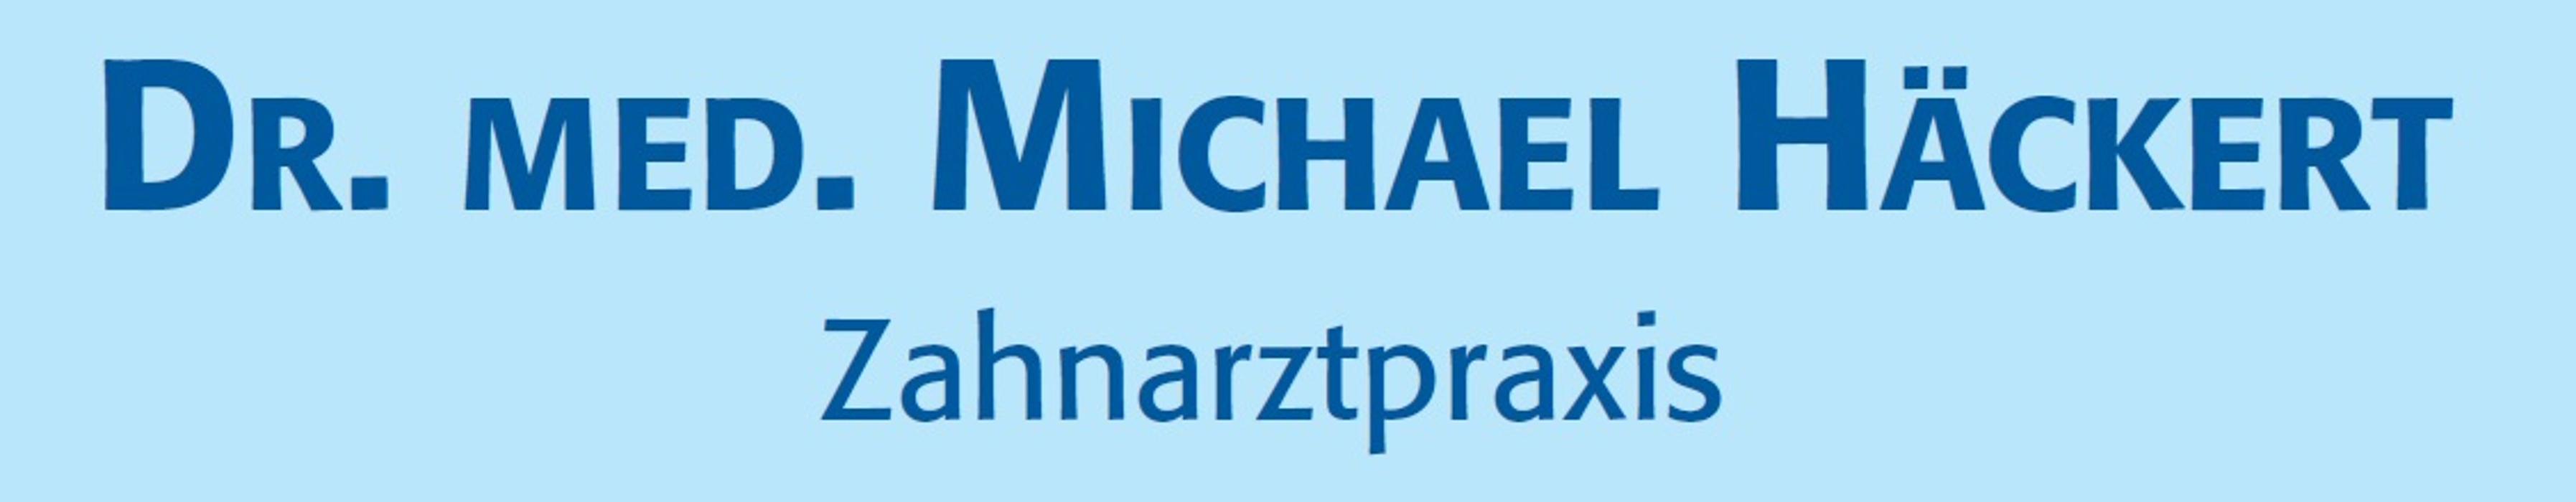 Bild zu Zahnarztpraxis Dr. Michael Häckert in Affinghausen